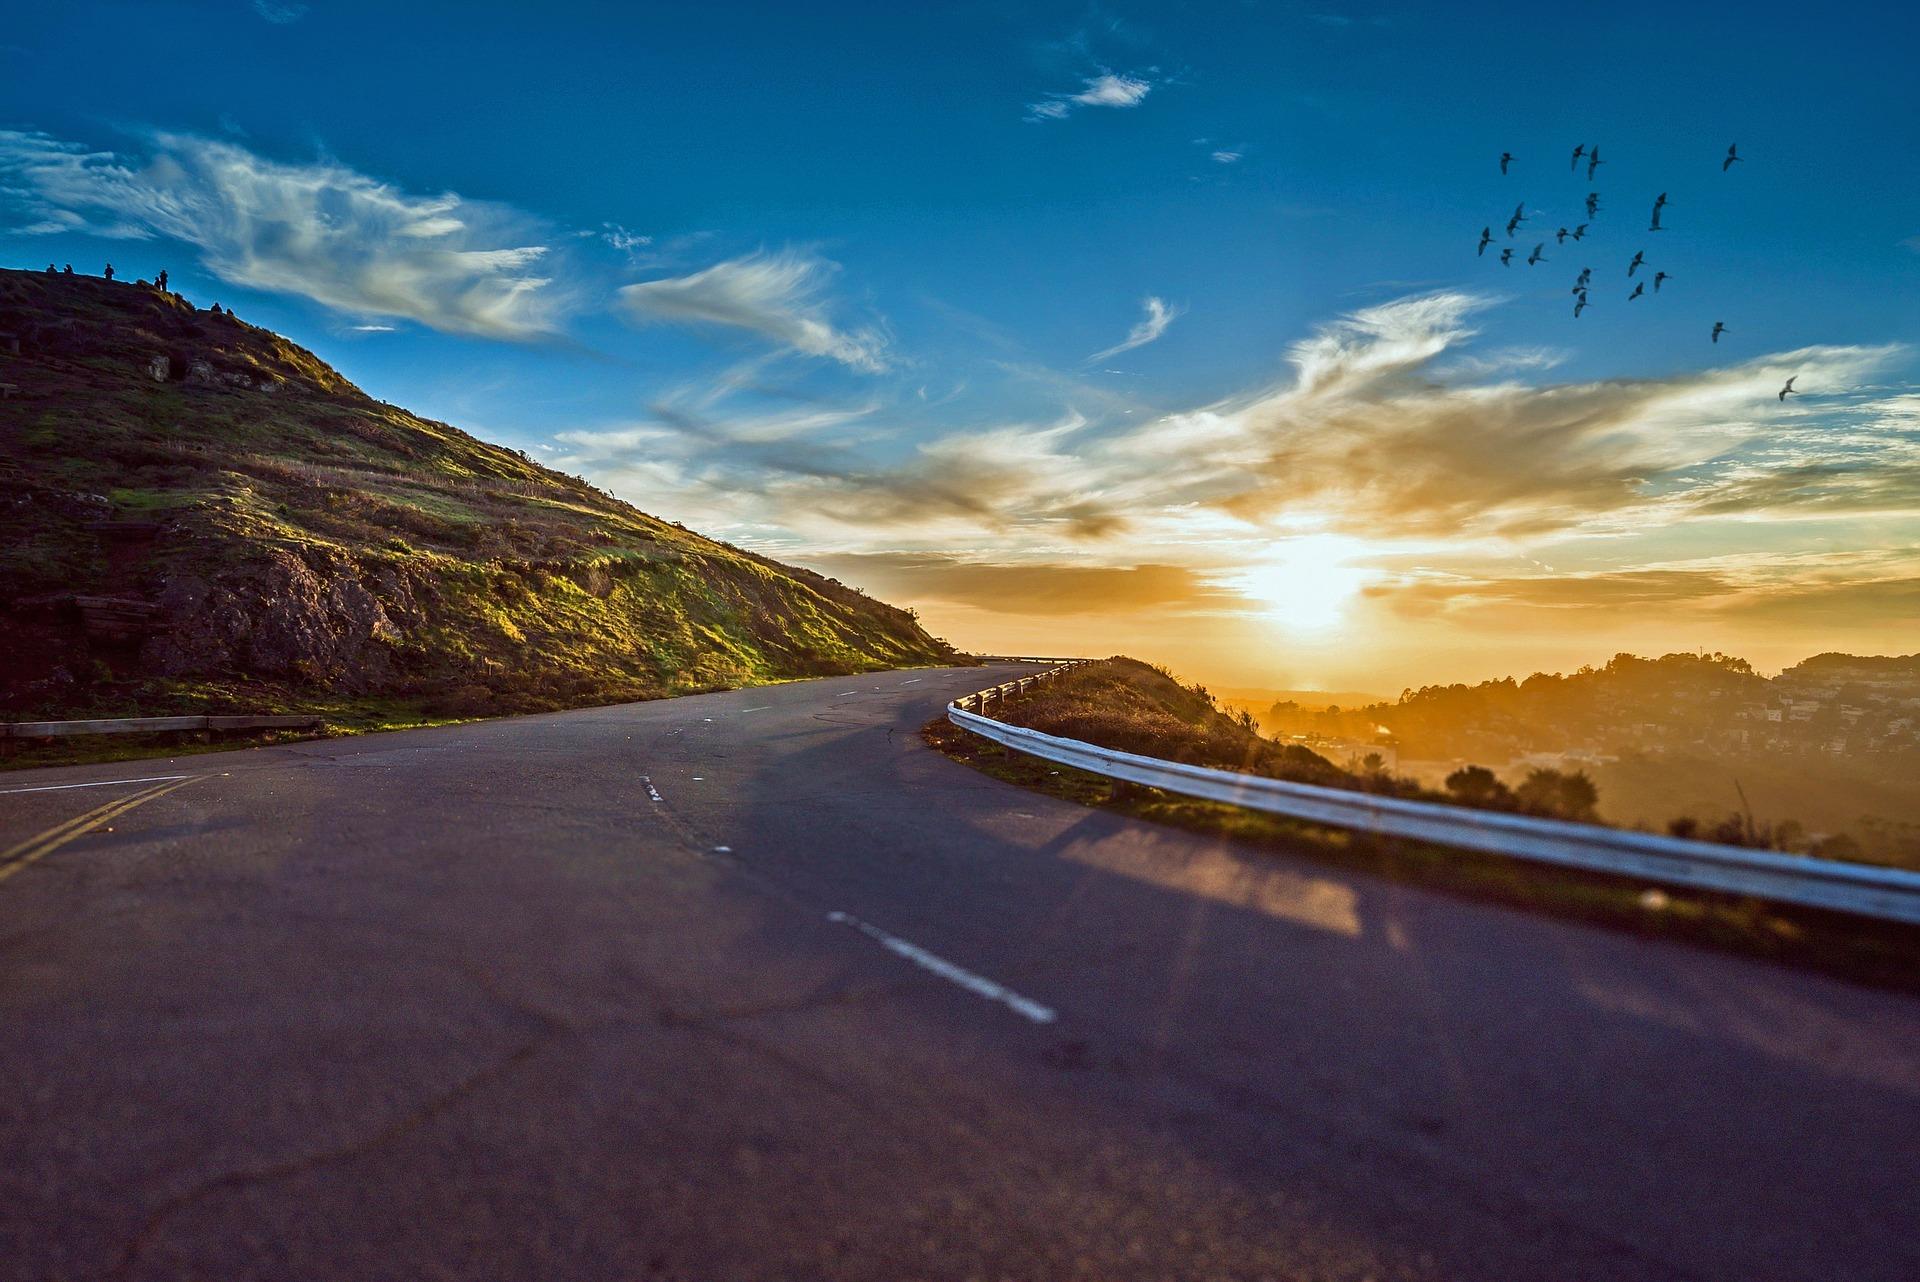 Roadside Assistance Insurance Policy Klamath Falls, OR